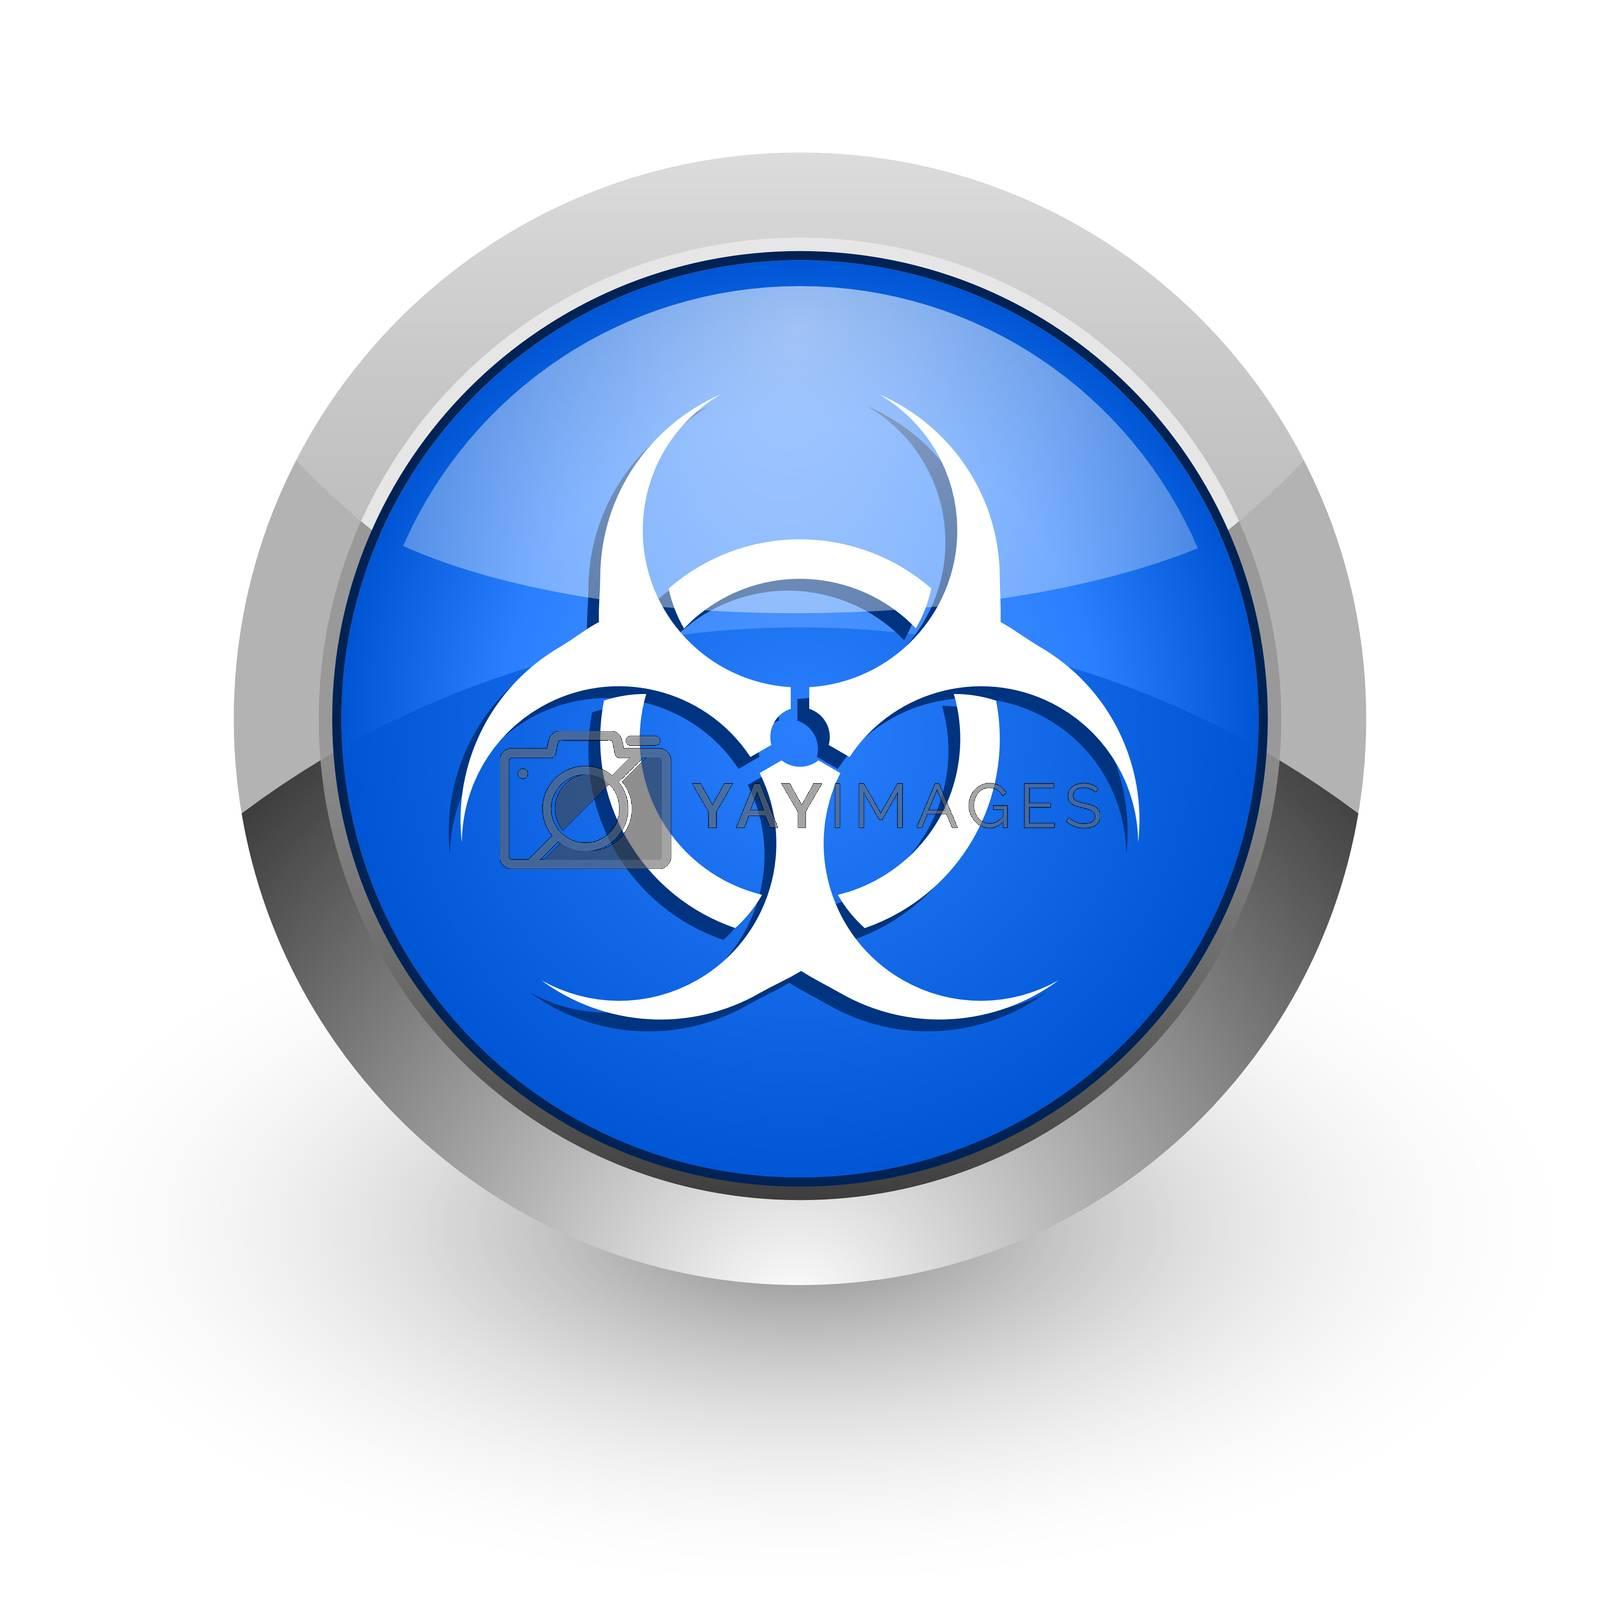 Royalty free image of biohazard blue glossy web icon by alexwhite